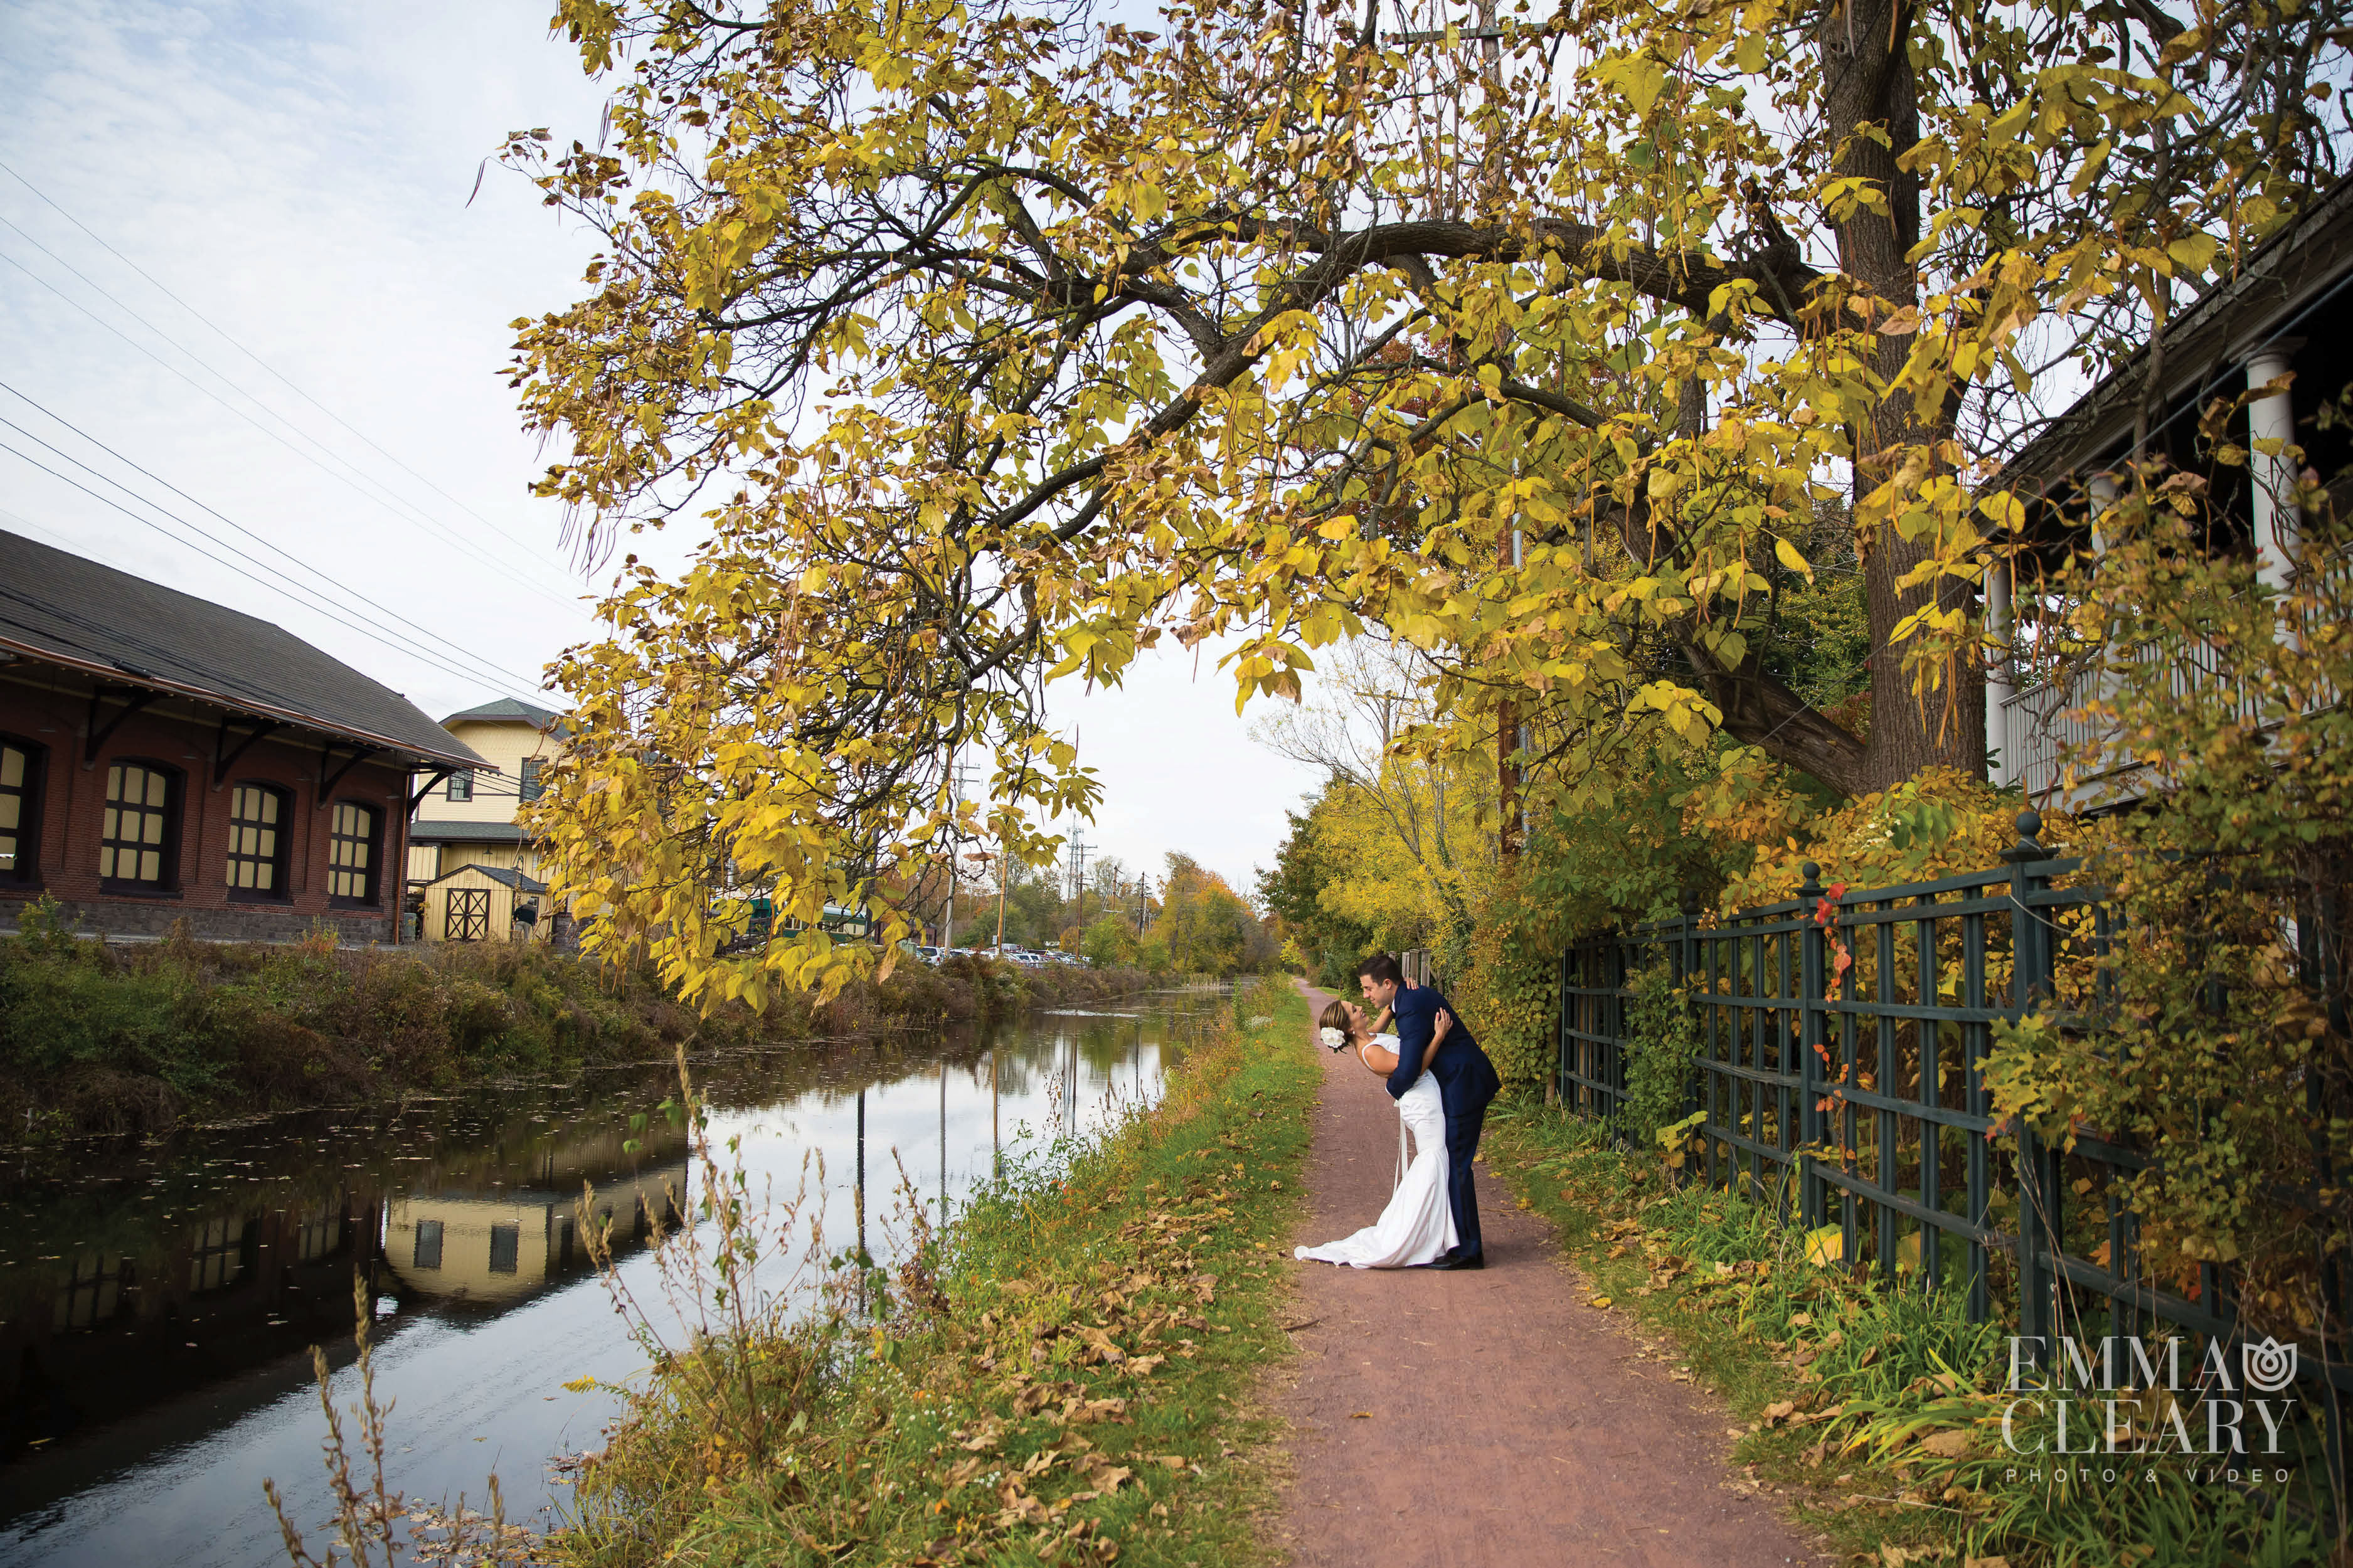 emma_cleary_photography-hotel-du-village-wedding10